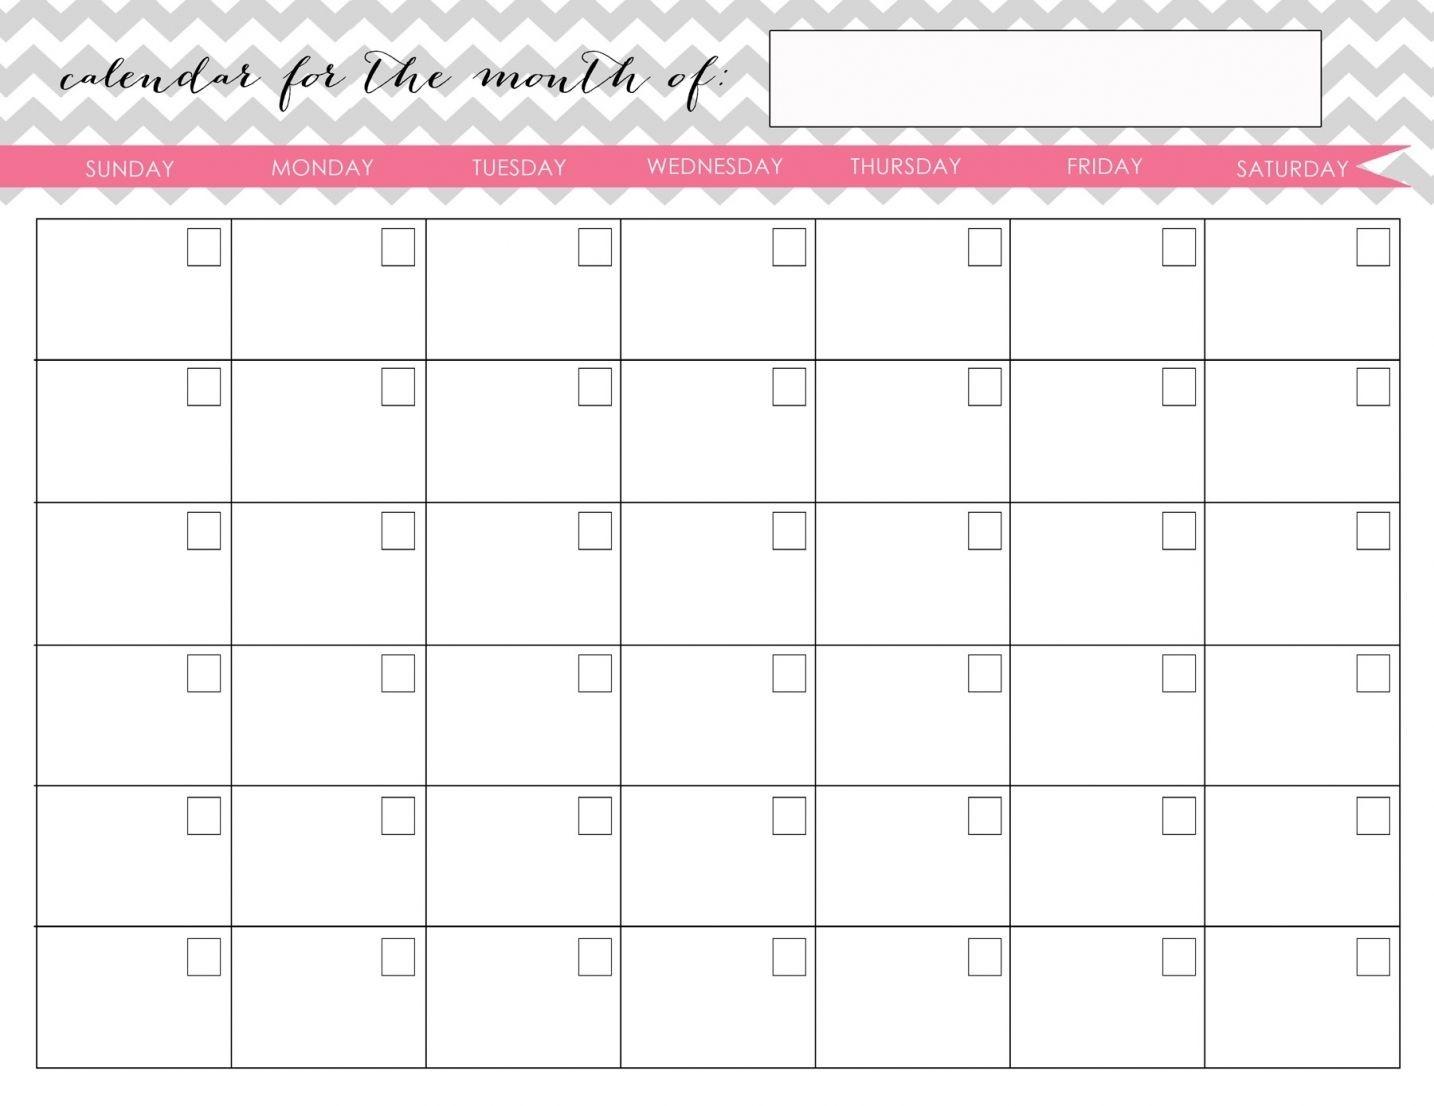 My Homekeeping Binder Kit   Monthly Calendar Printable, Calender Printables, Calendar Printables-Printable Fill In Calendar By Month